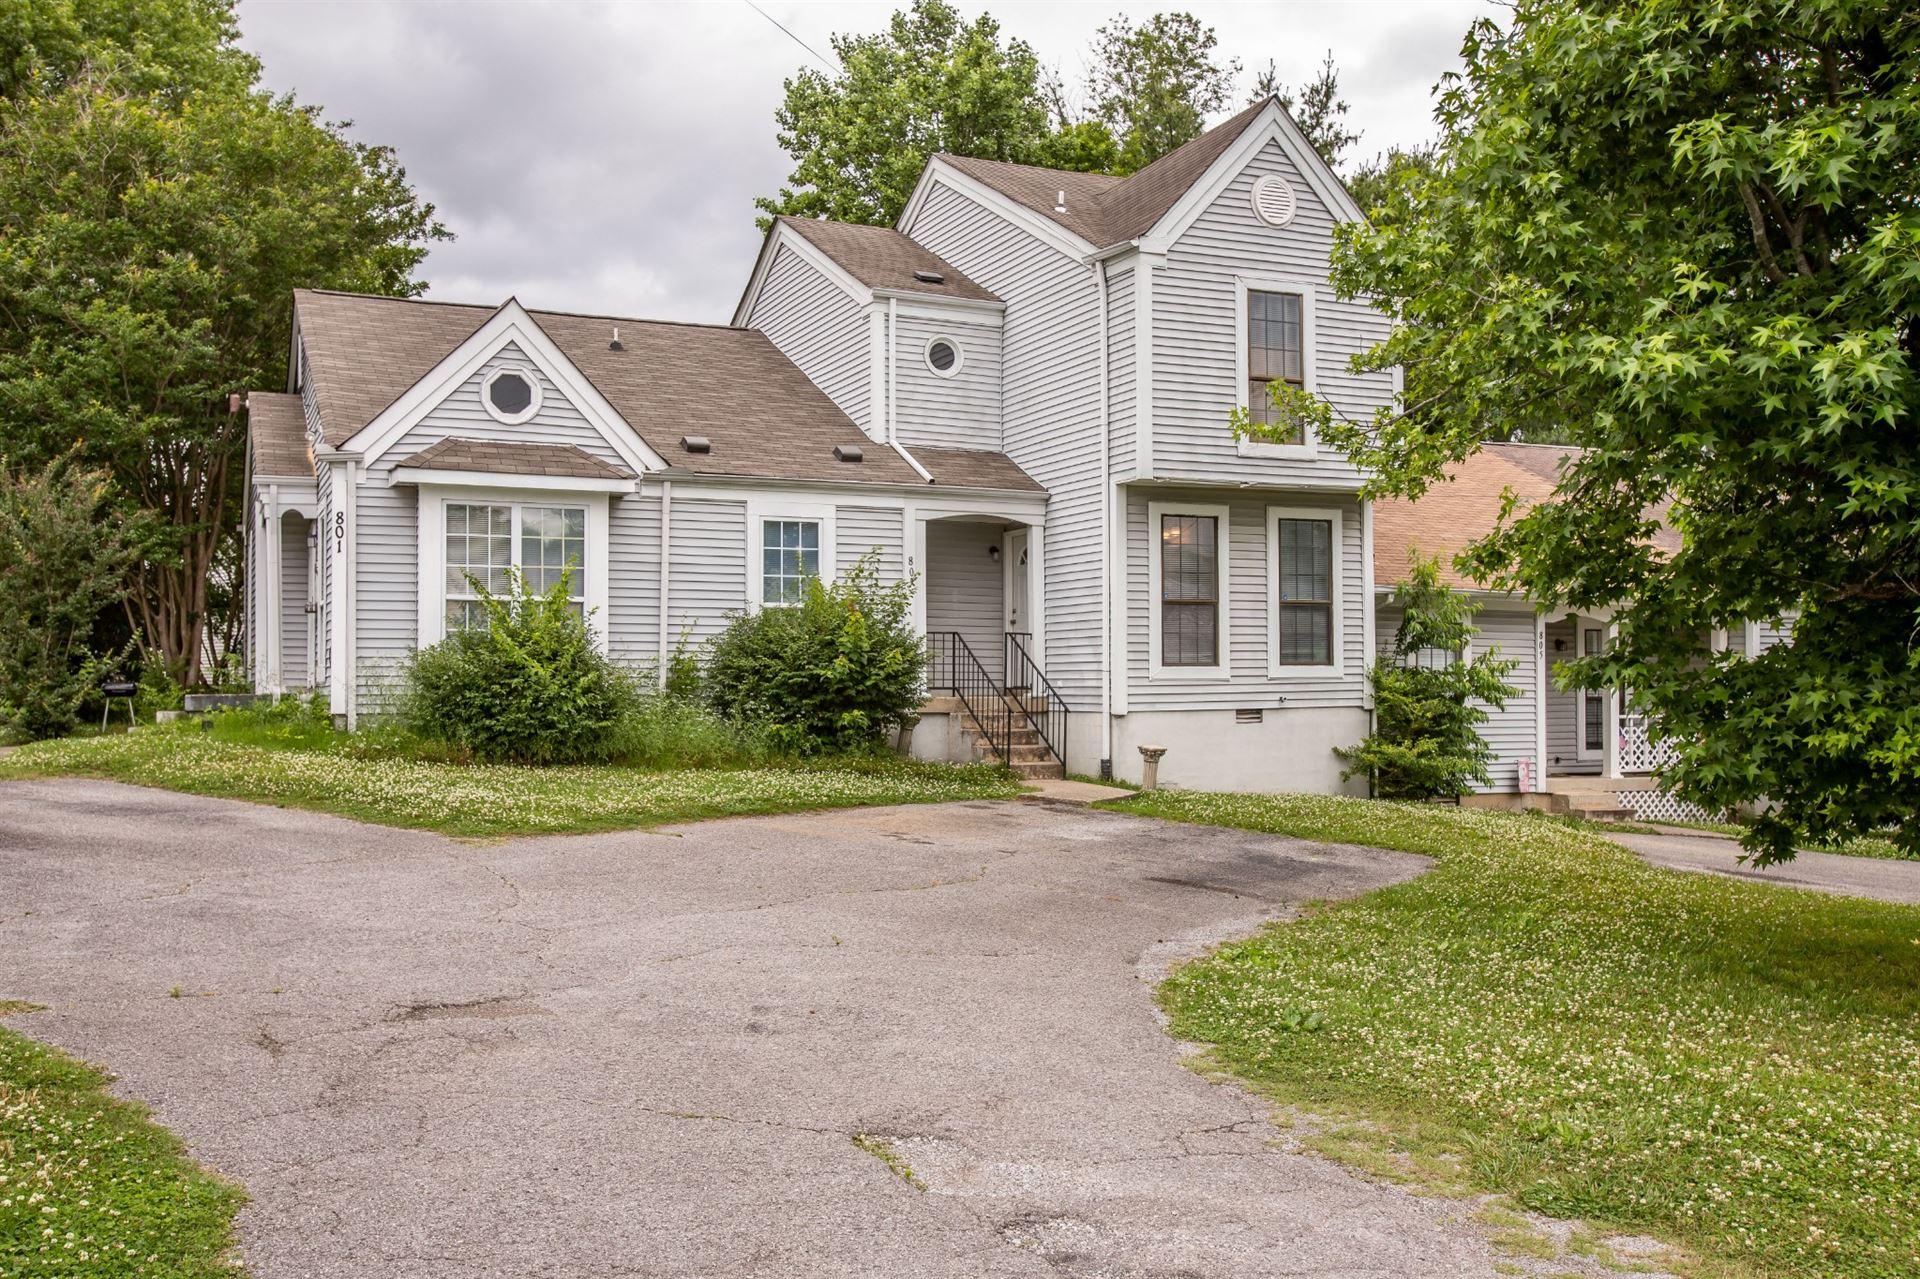 803 Rachels Vw, Hermitage, TN 37076 - MLS#: 2261301